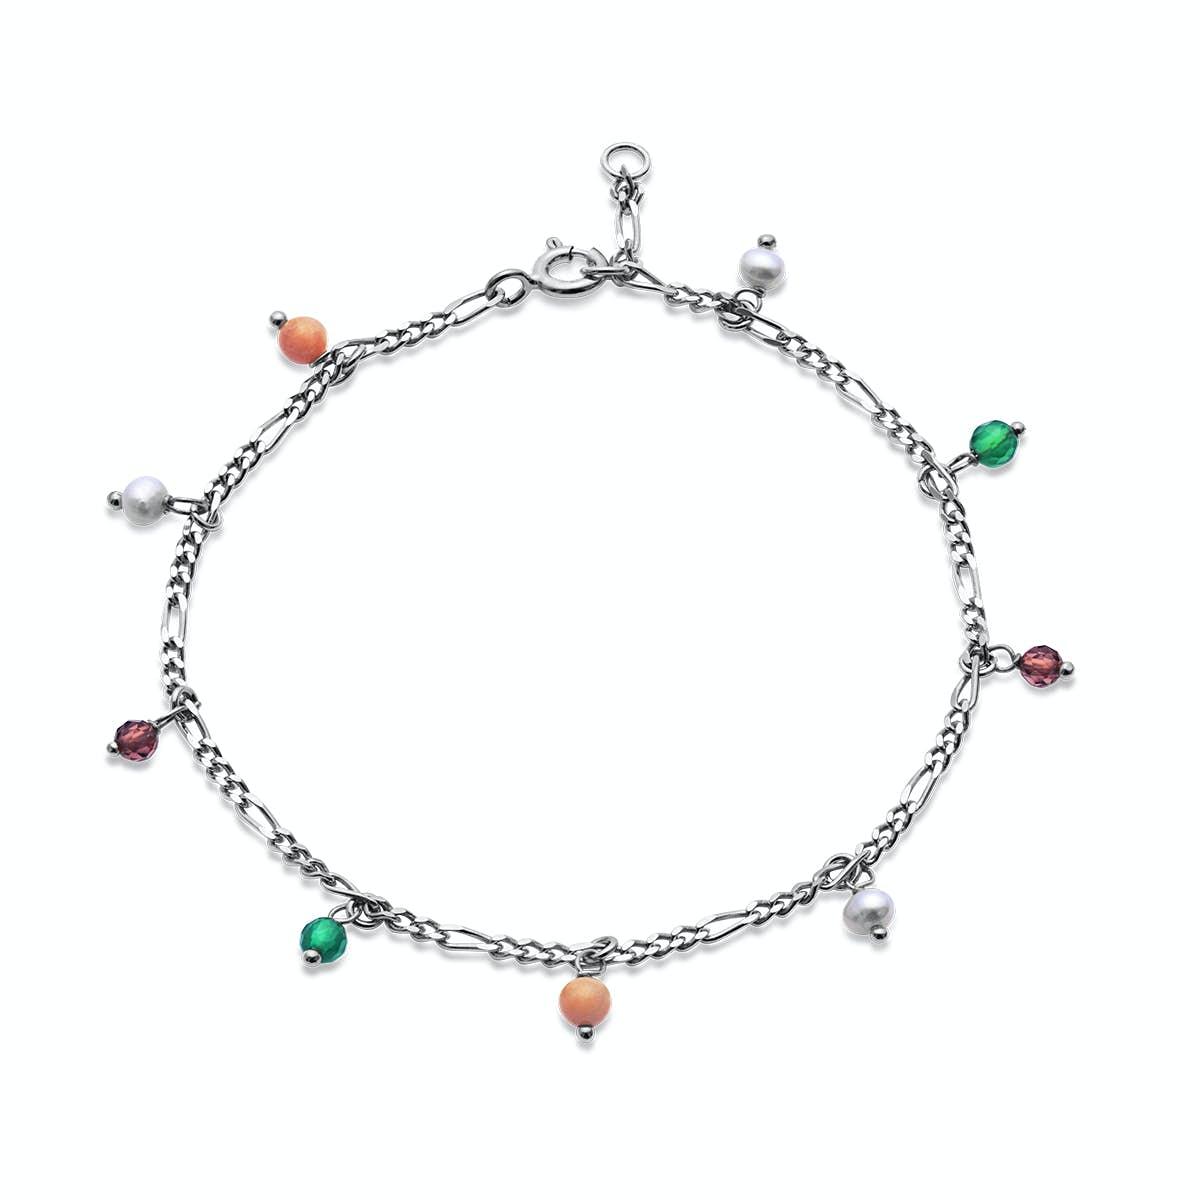 Salma color bracelet von Maanesten in Silber Sterling 925 Blank